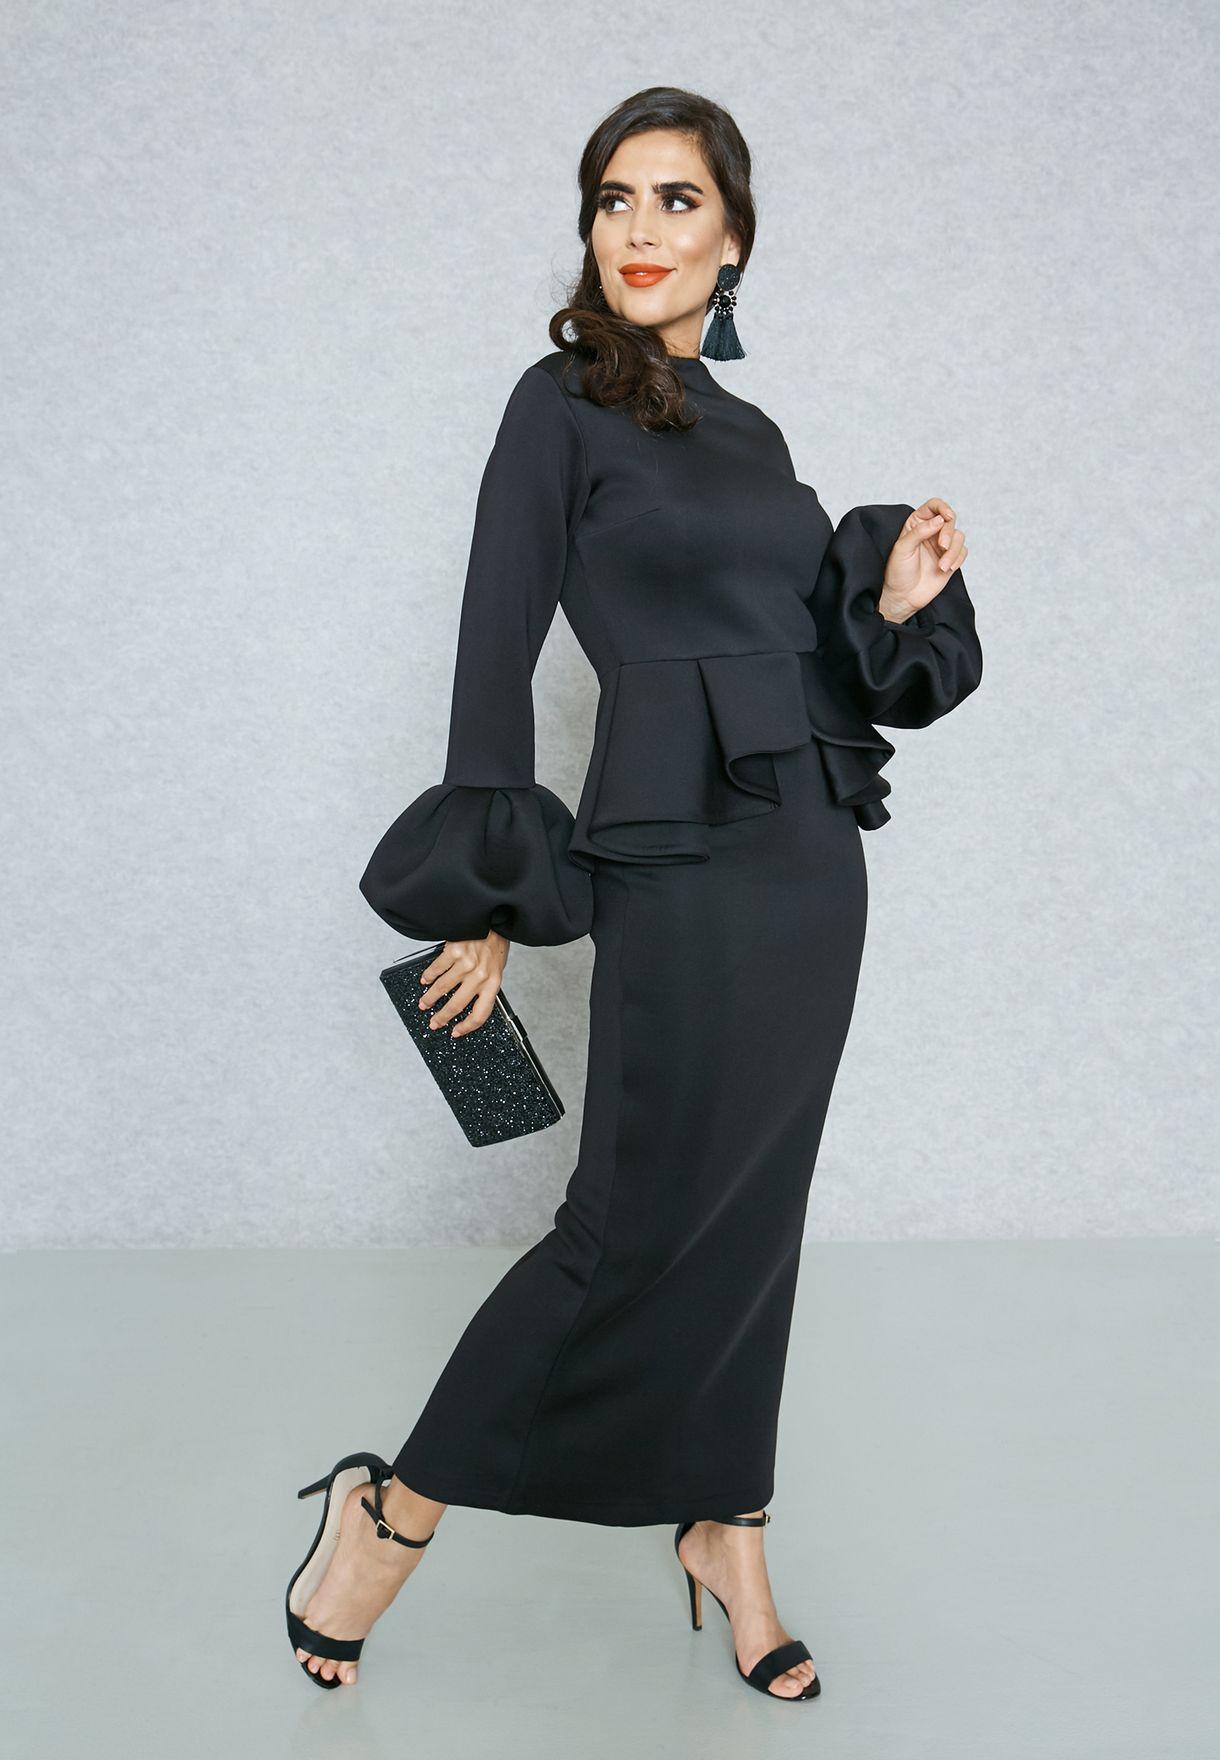 da05b3ce2f248 Shop Threadz black Puffed Sleeve Peplum Bardot Dress AP12 for Women ...